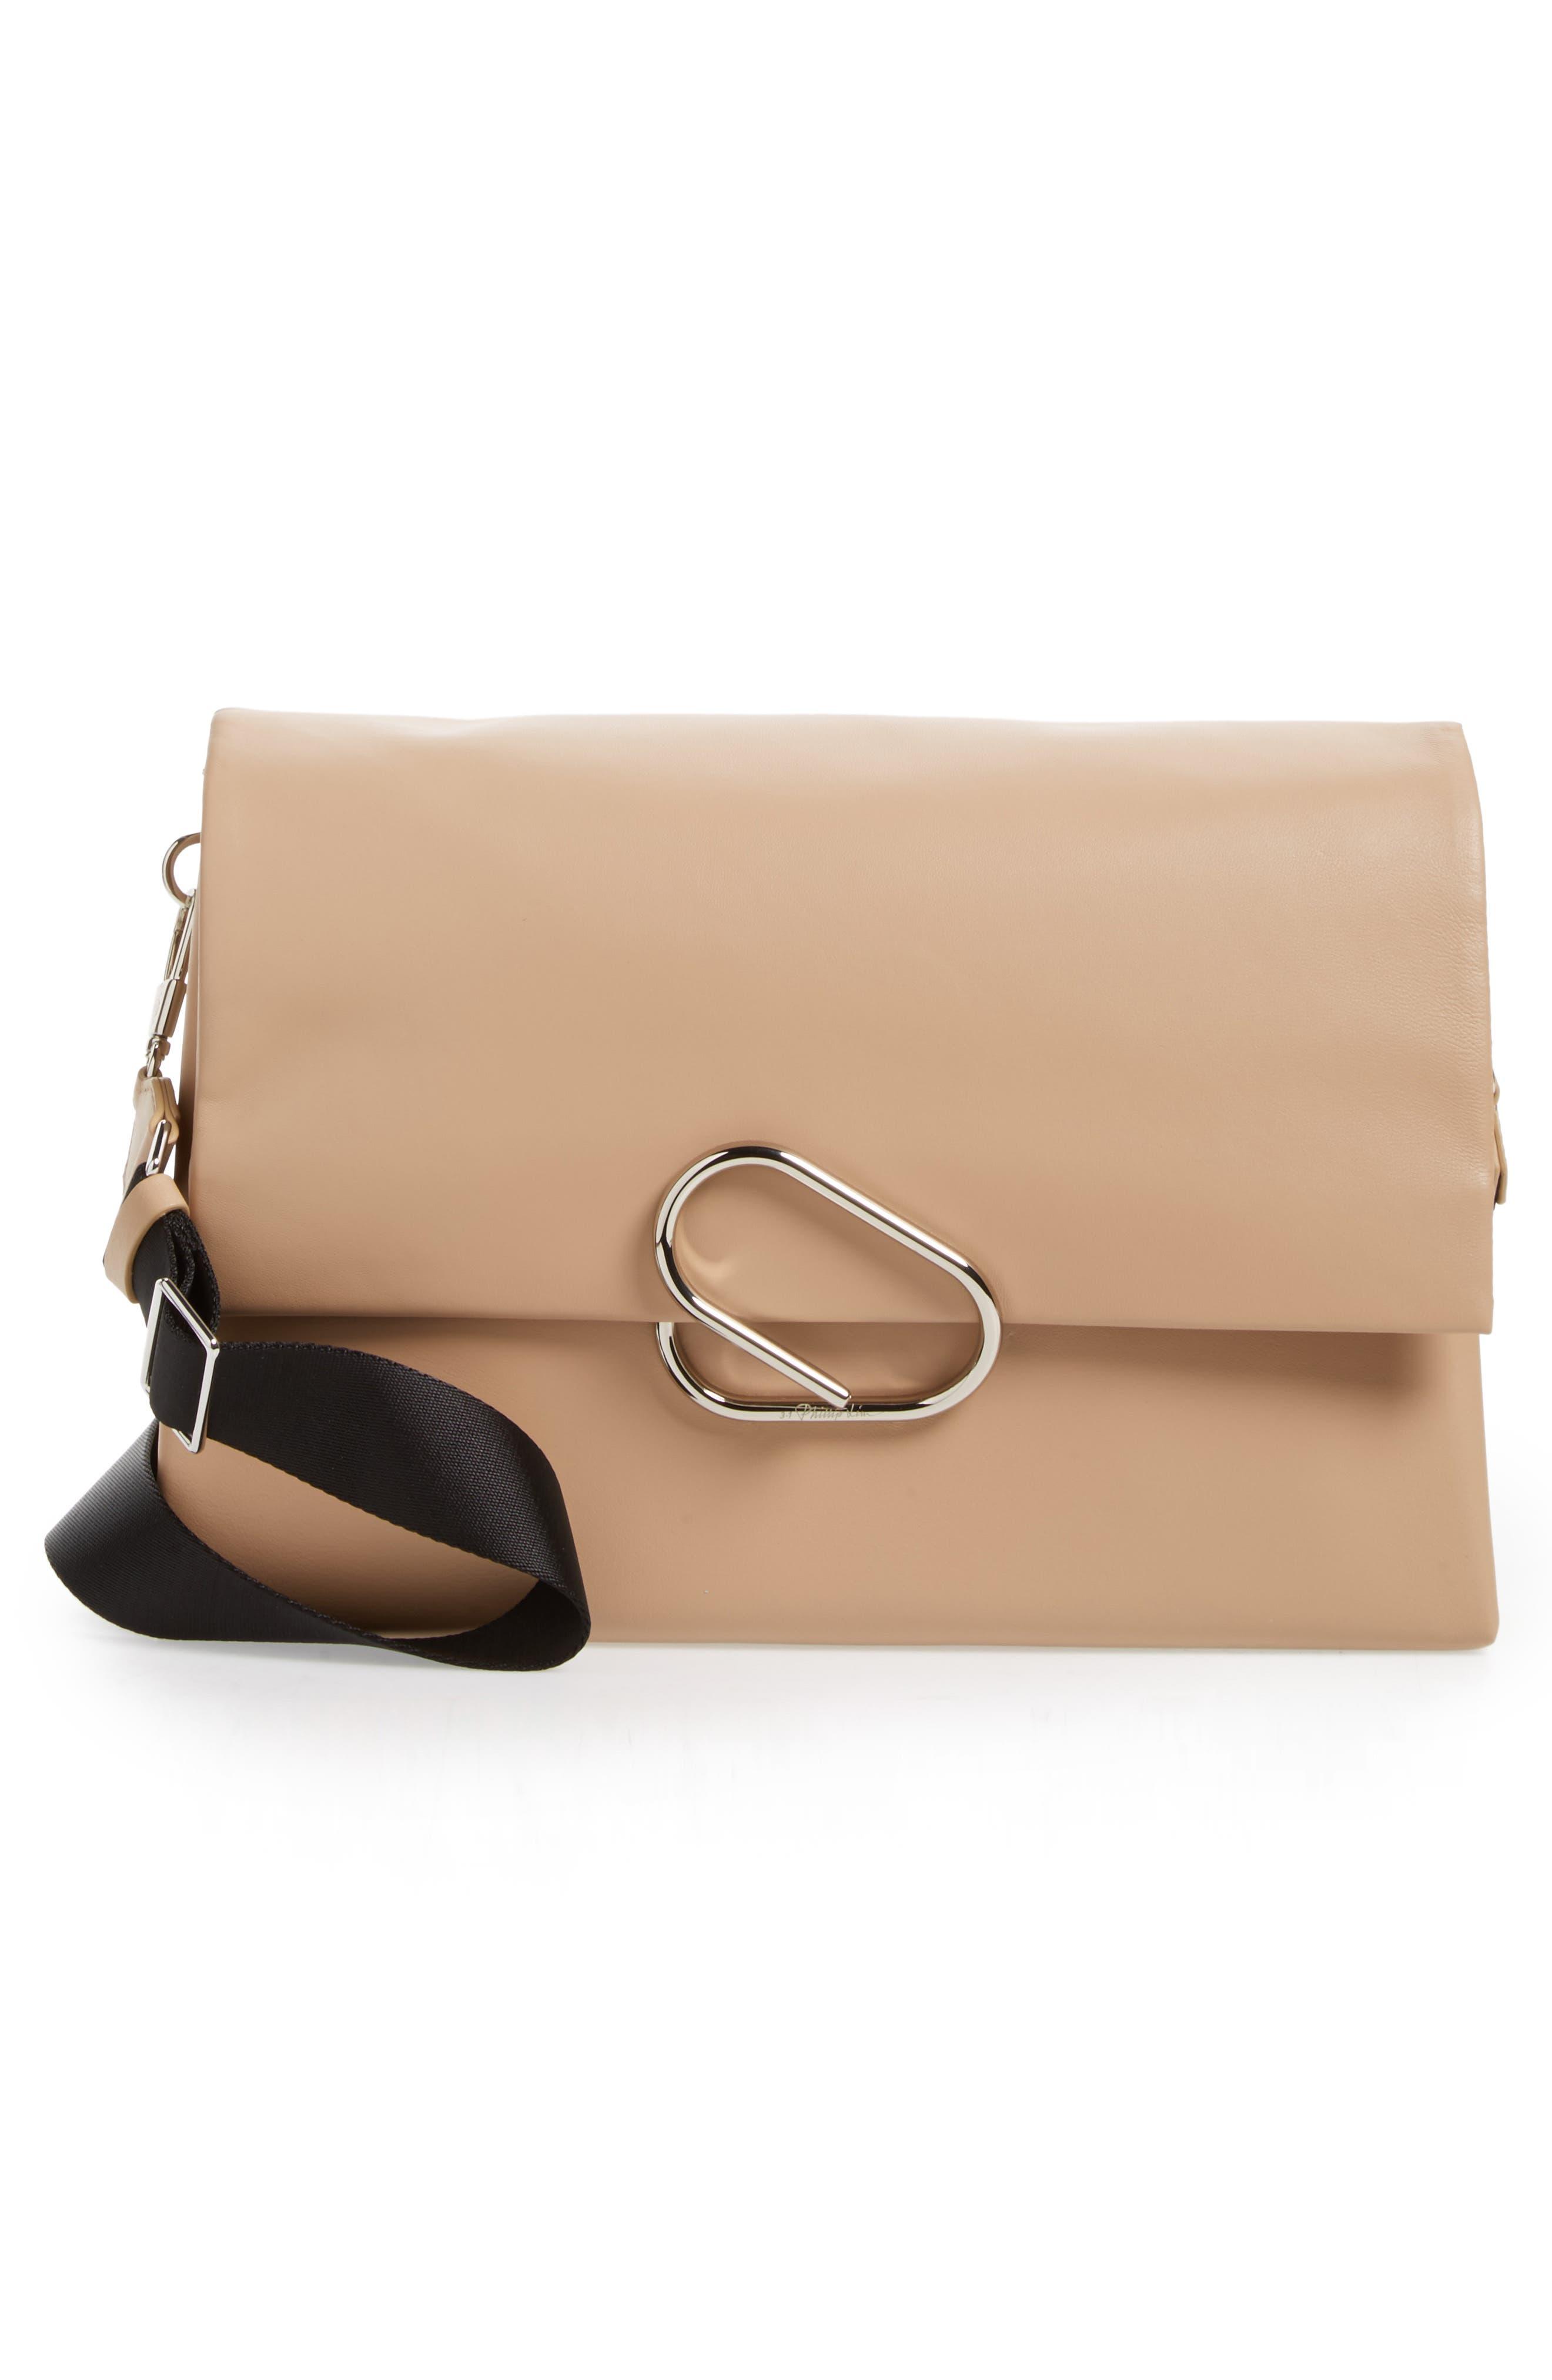 Oversized Alix Flap Leather Shoulder Bag,                             Alternate thumbnail 3, color,                             260